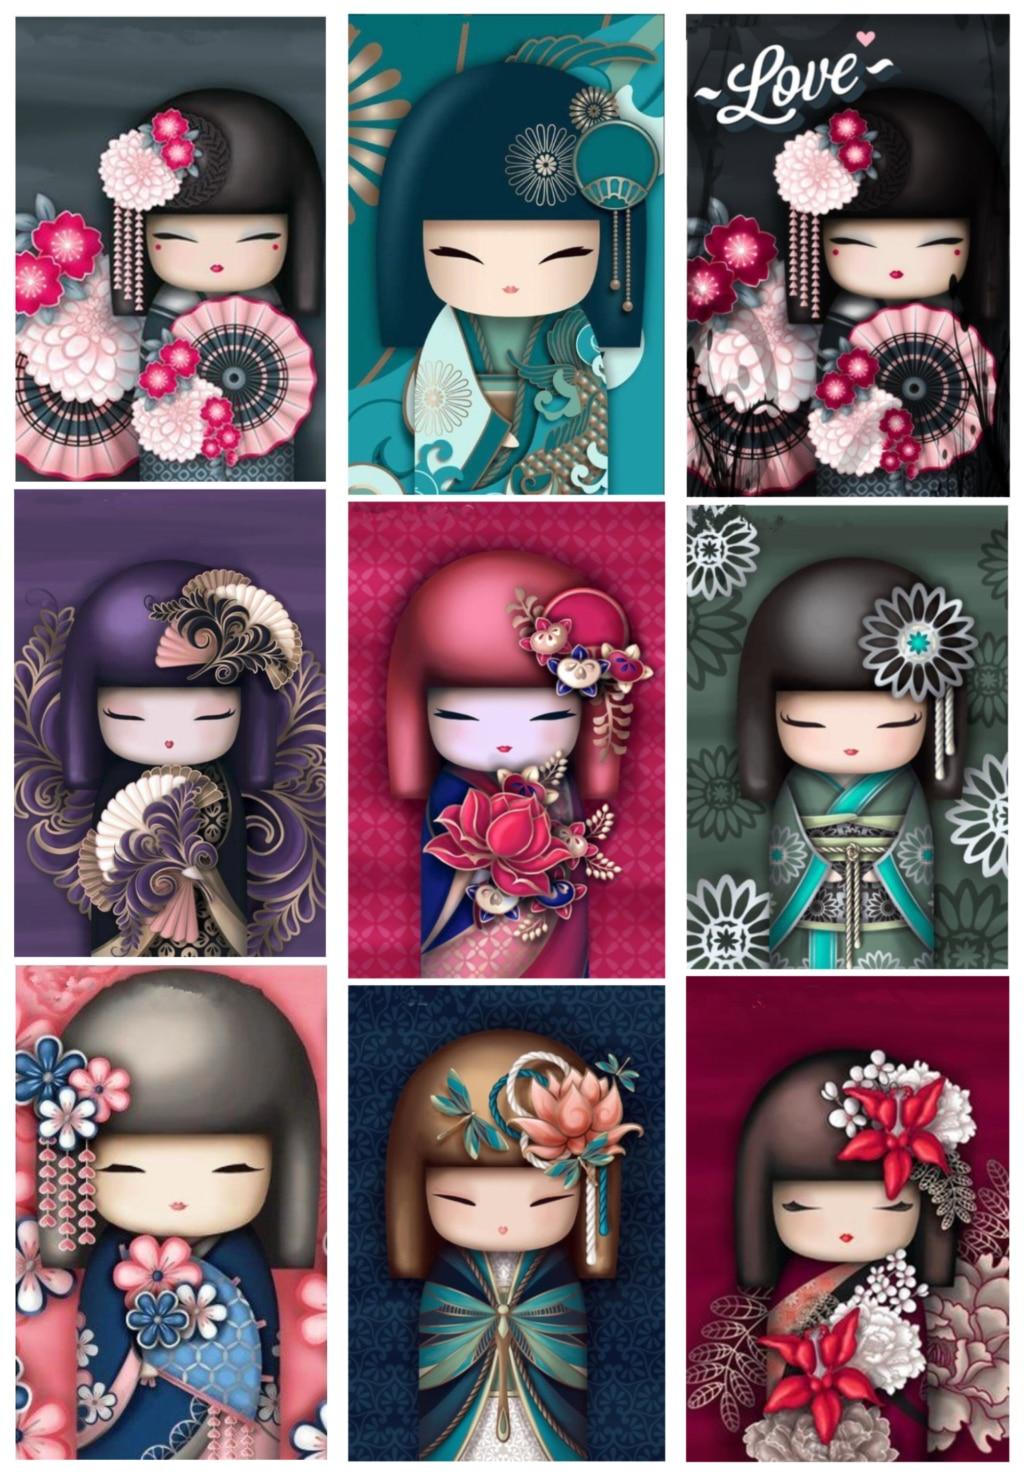 5D DIY pintura de diamantes Kimono muñecas mosaico de diamantes cuadro con dibujo bordado de diamantes de imitación kits de costura de regalo